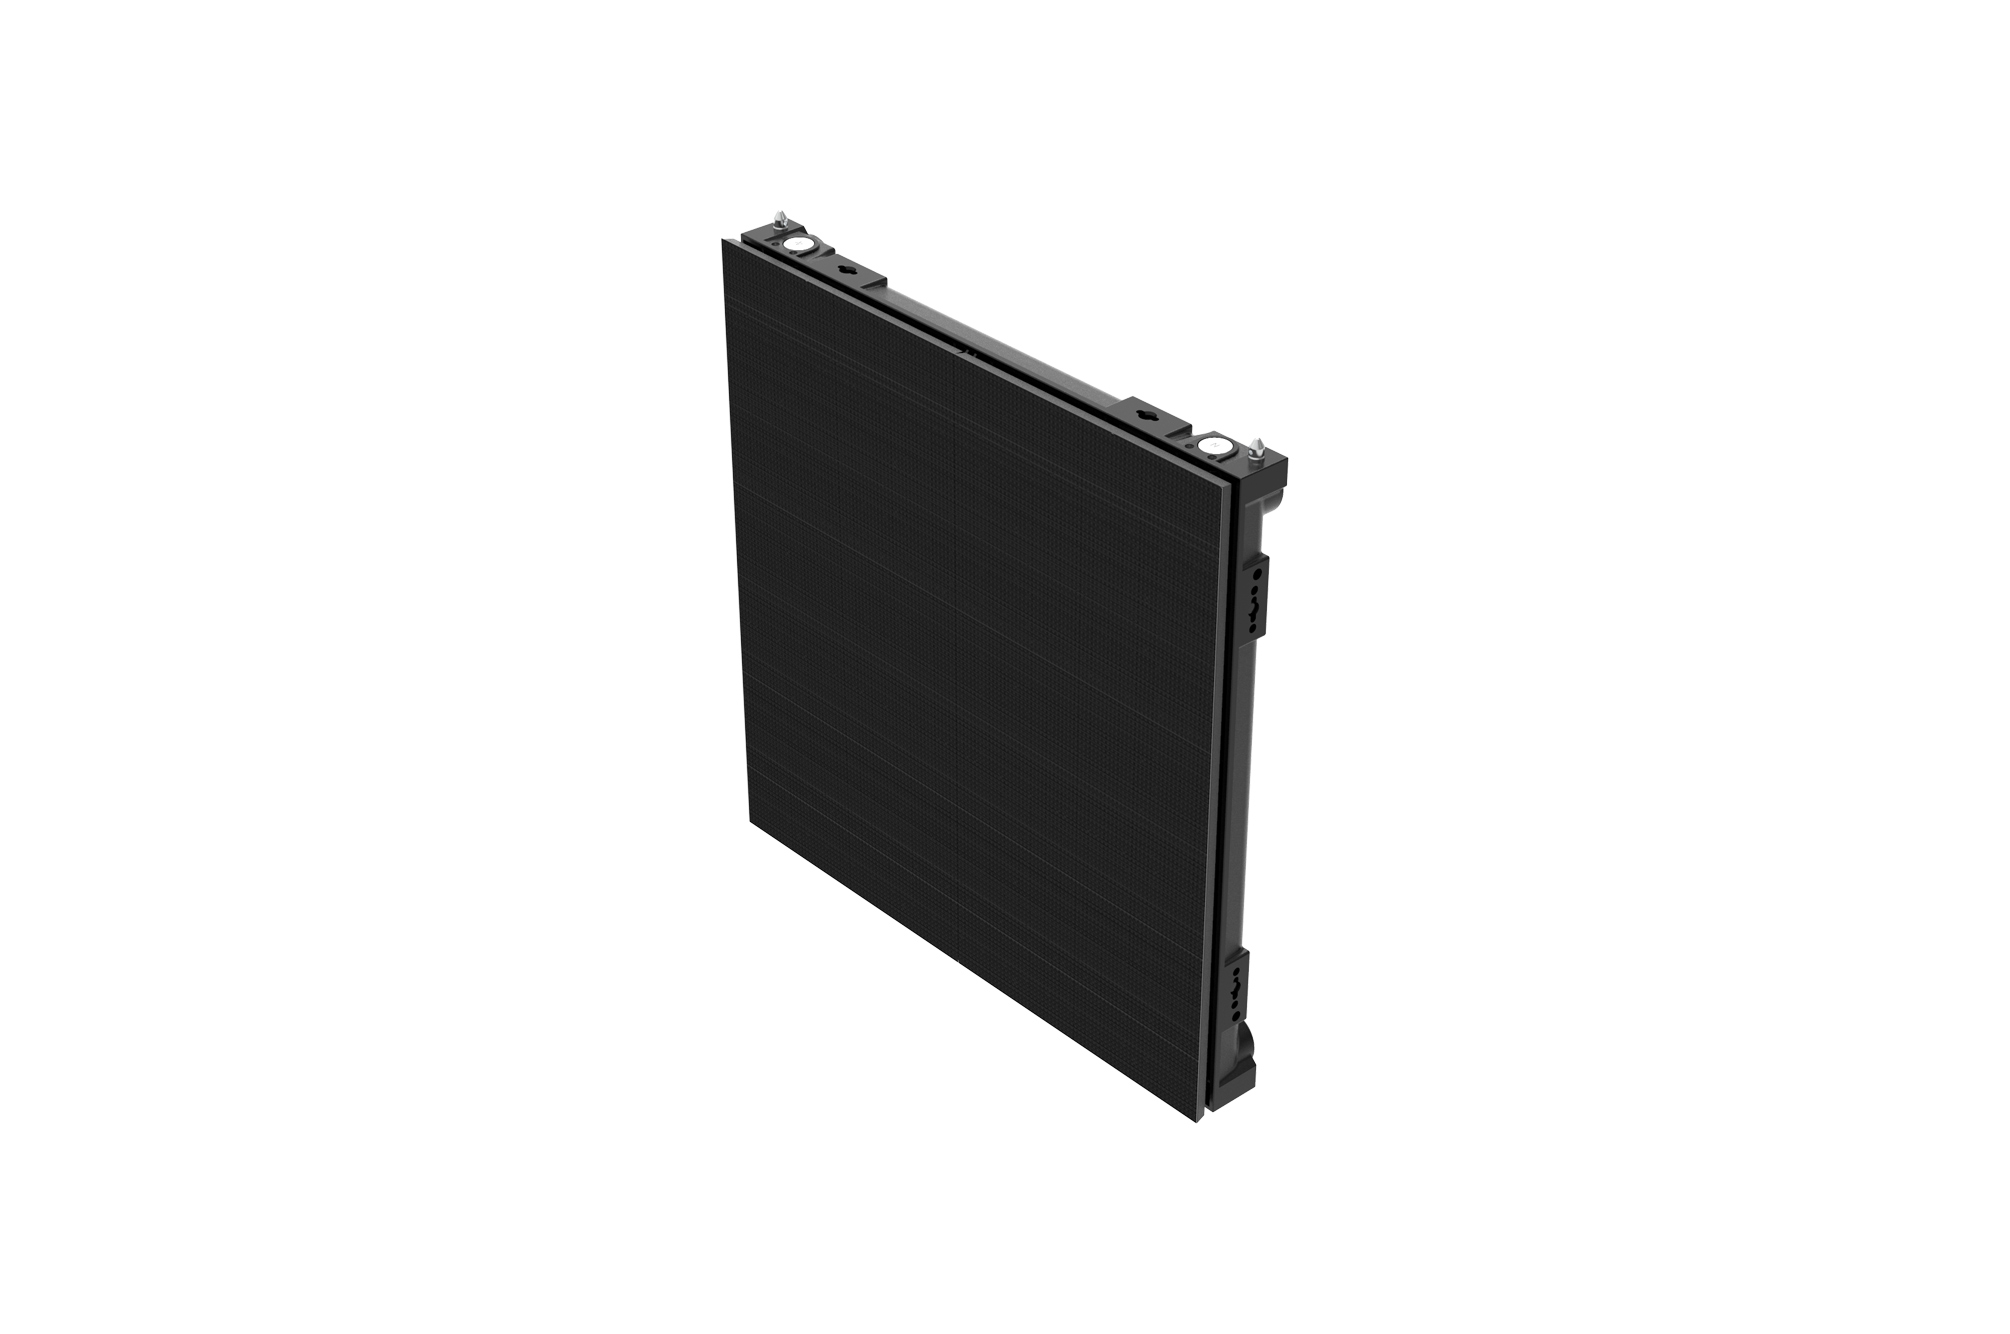 LG Versatile LSCA029 14